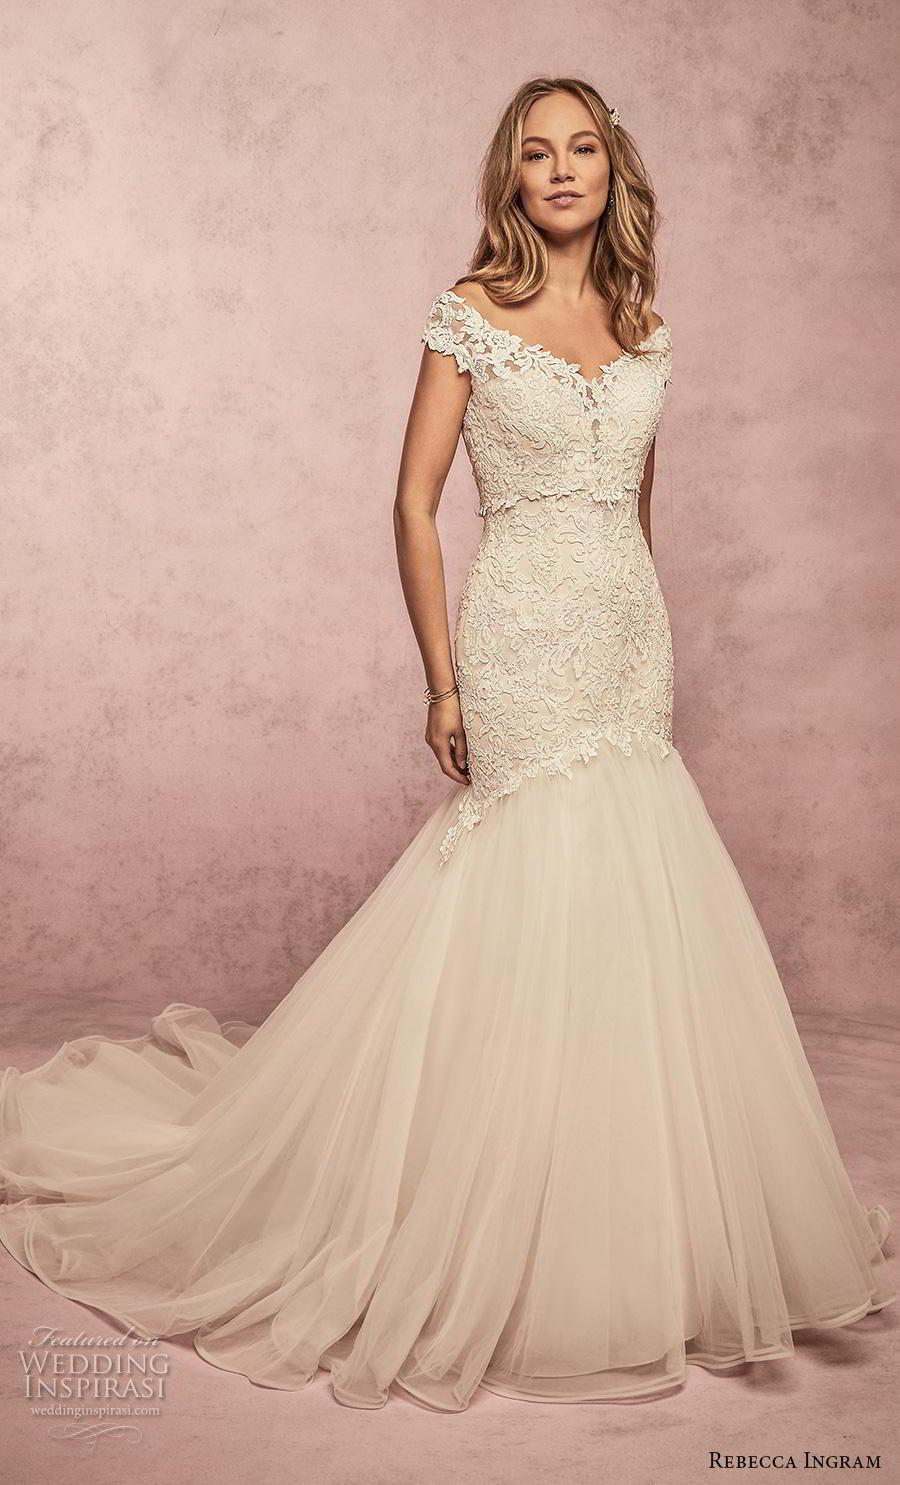 rebecca ingram s2019 bridal cap sleeves v neck heavily embellished bodice romanti mermaid wedding dress mid back chapel train (15) mv